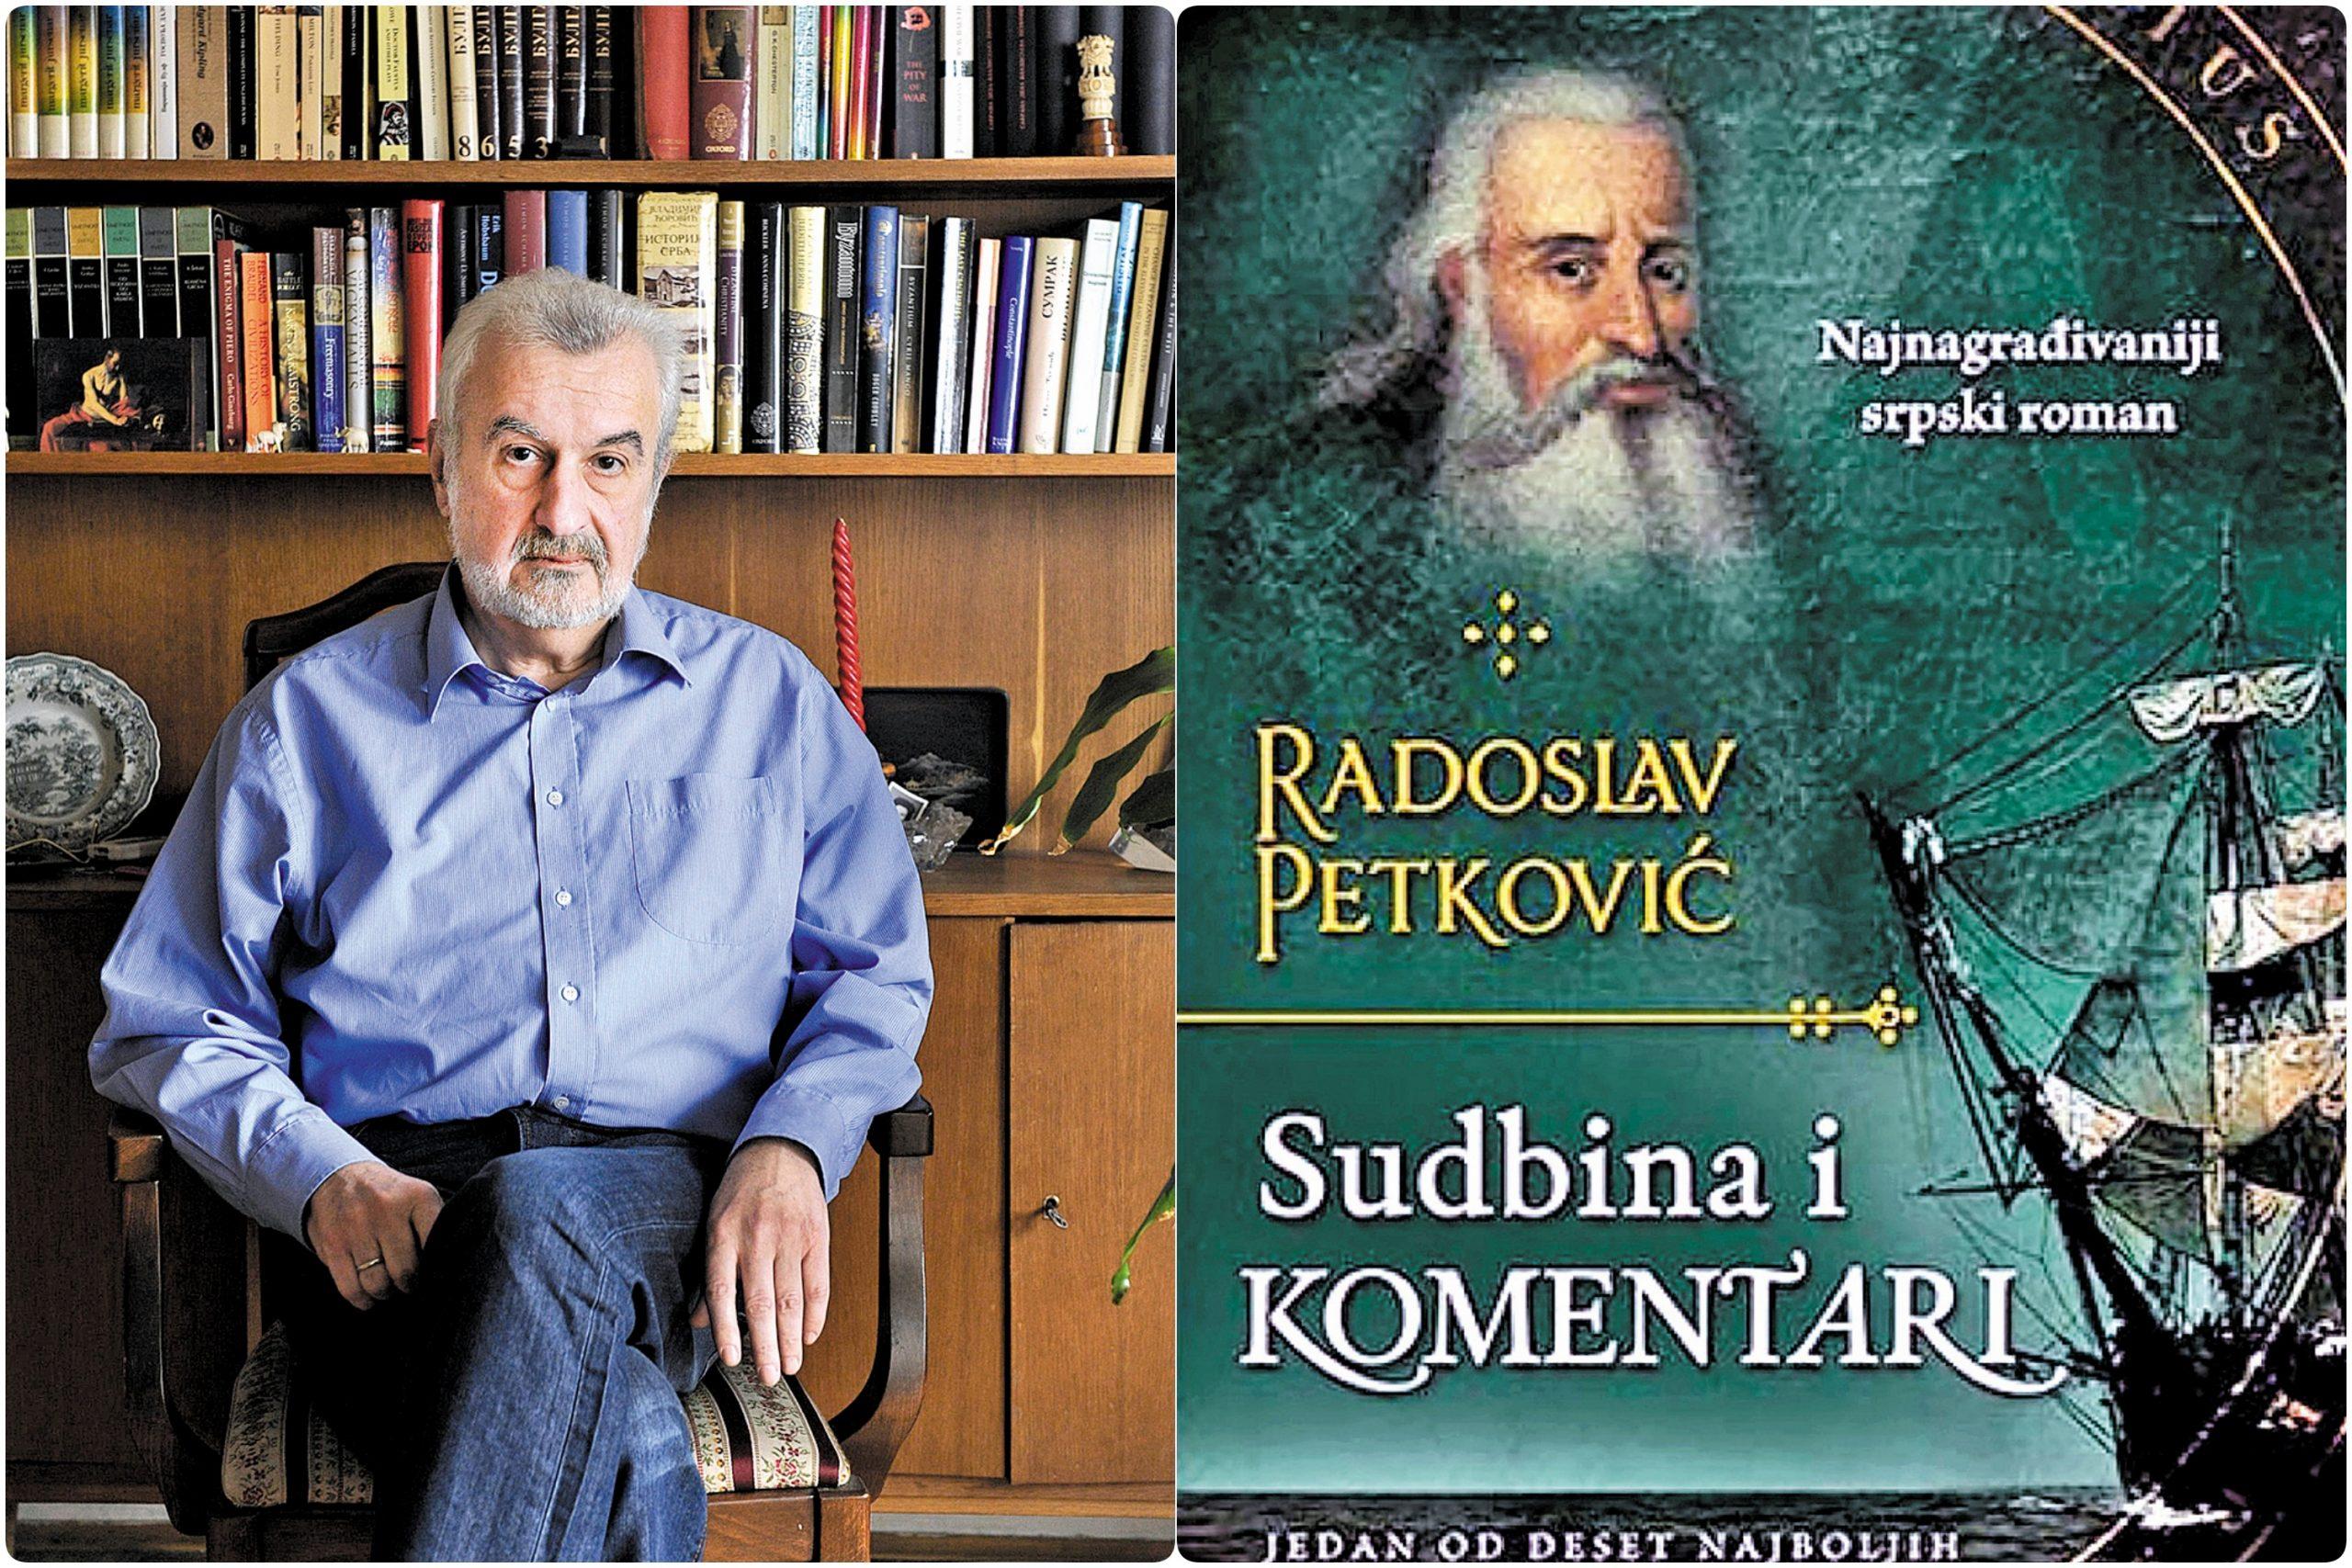 Radoslav Petkovic Sudbina i komentari